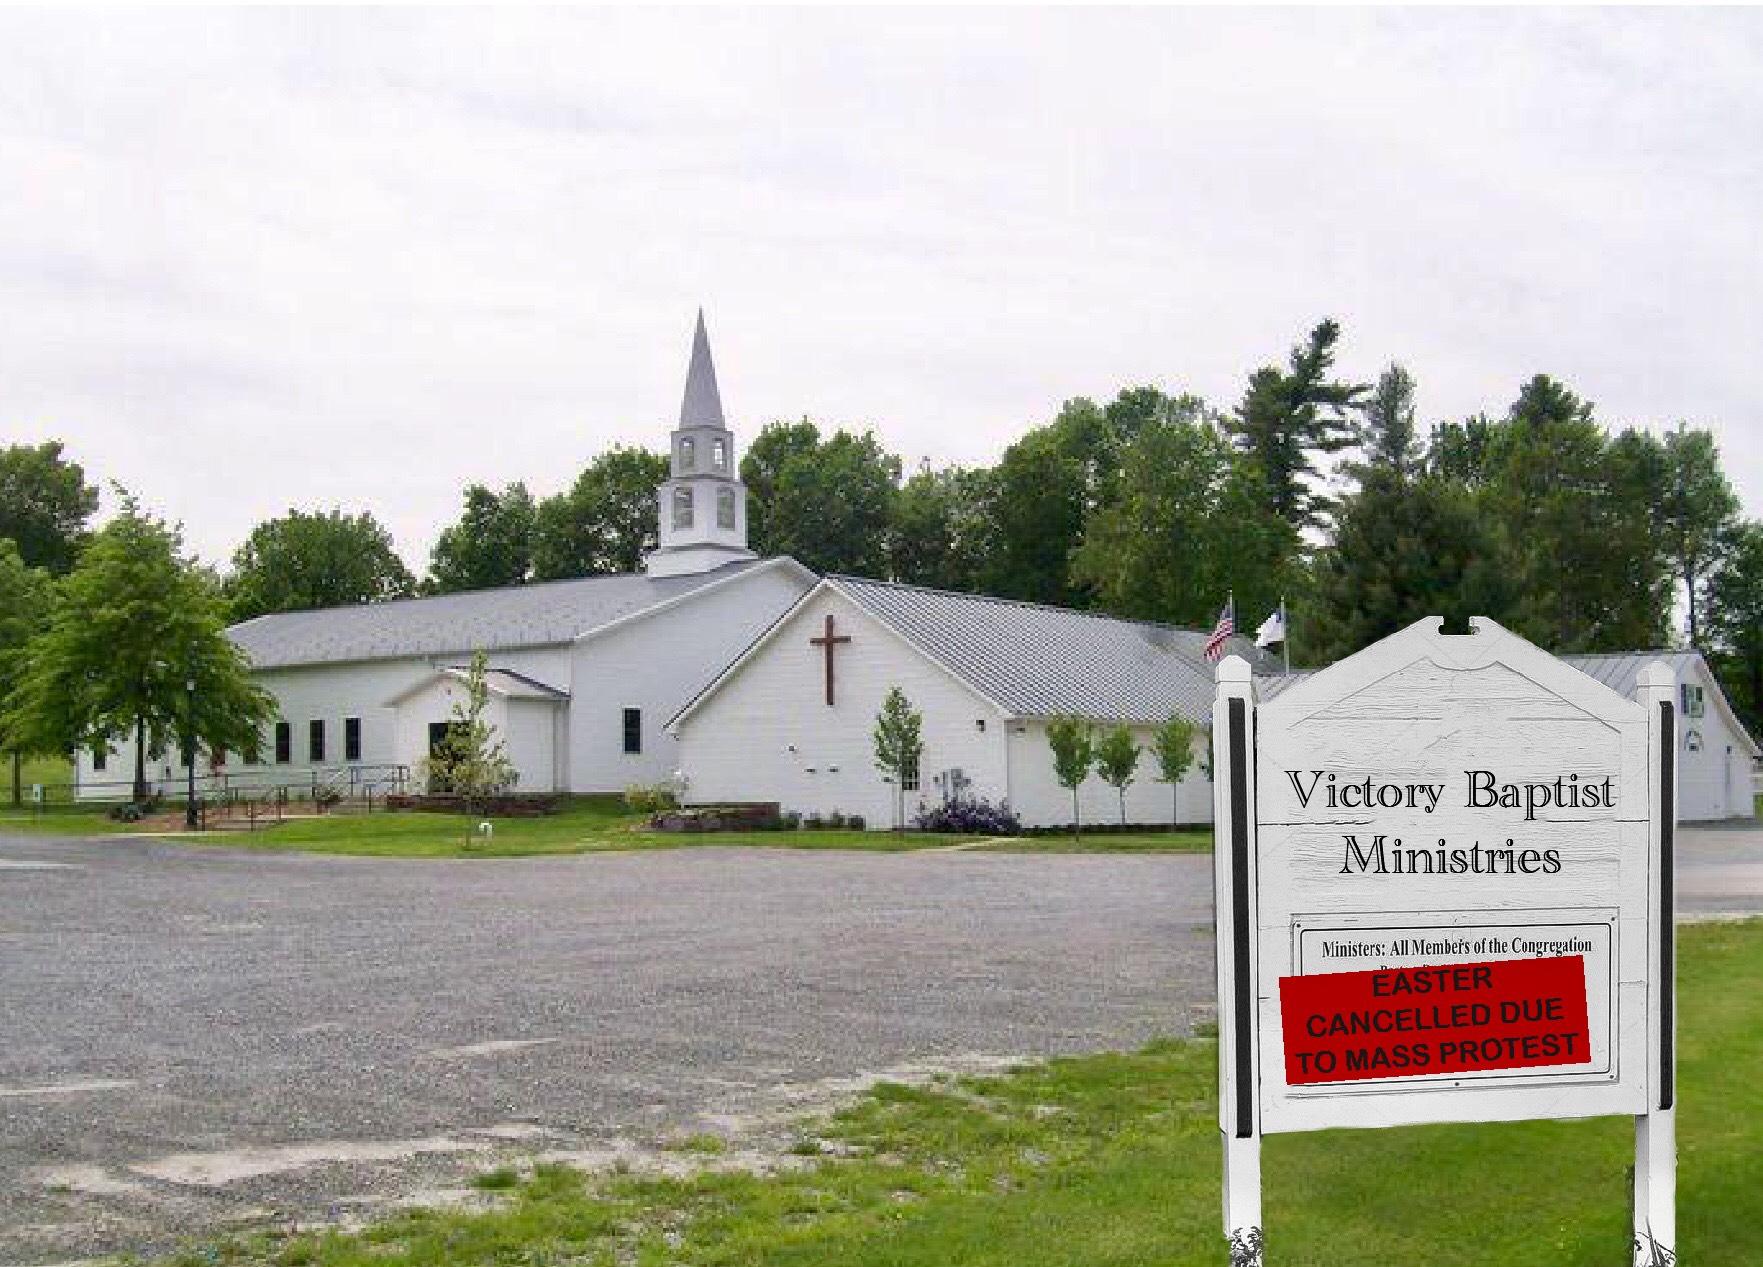 College Cancels Jesus' Resurrection Due to Safety Concerns